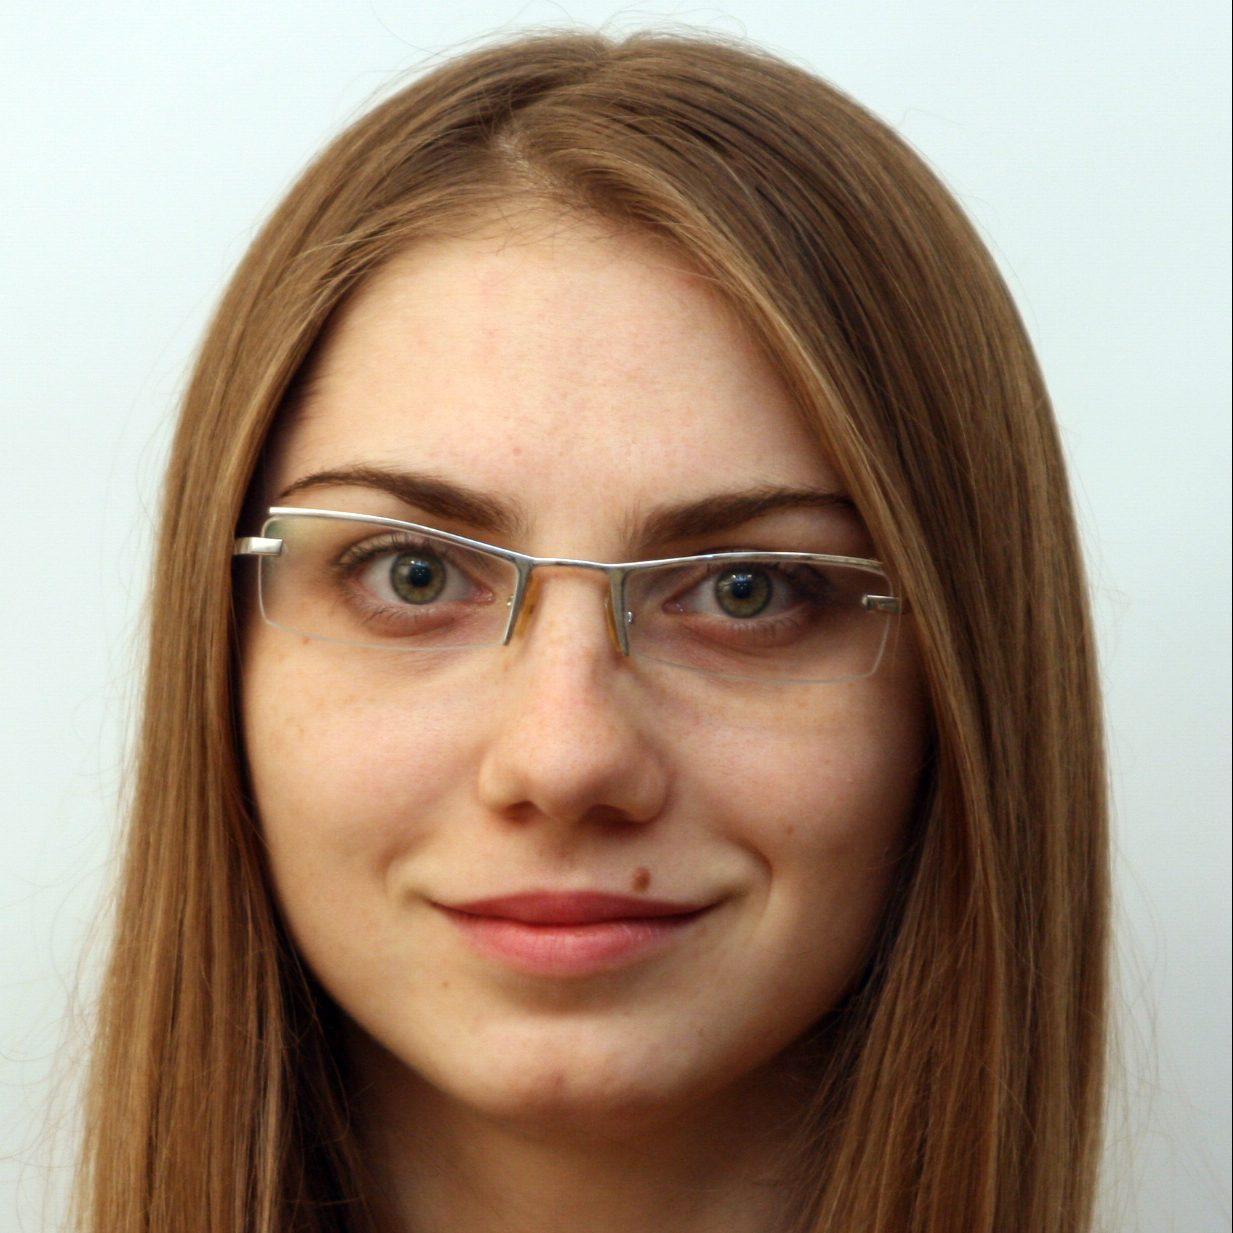 Esma Mujkic